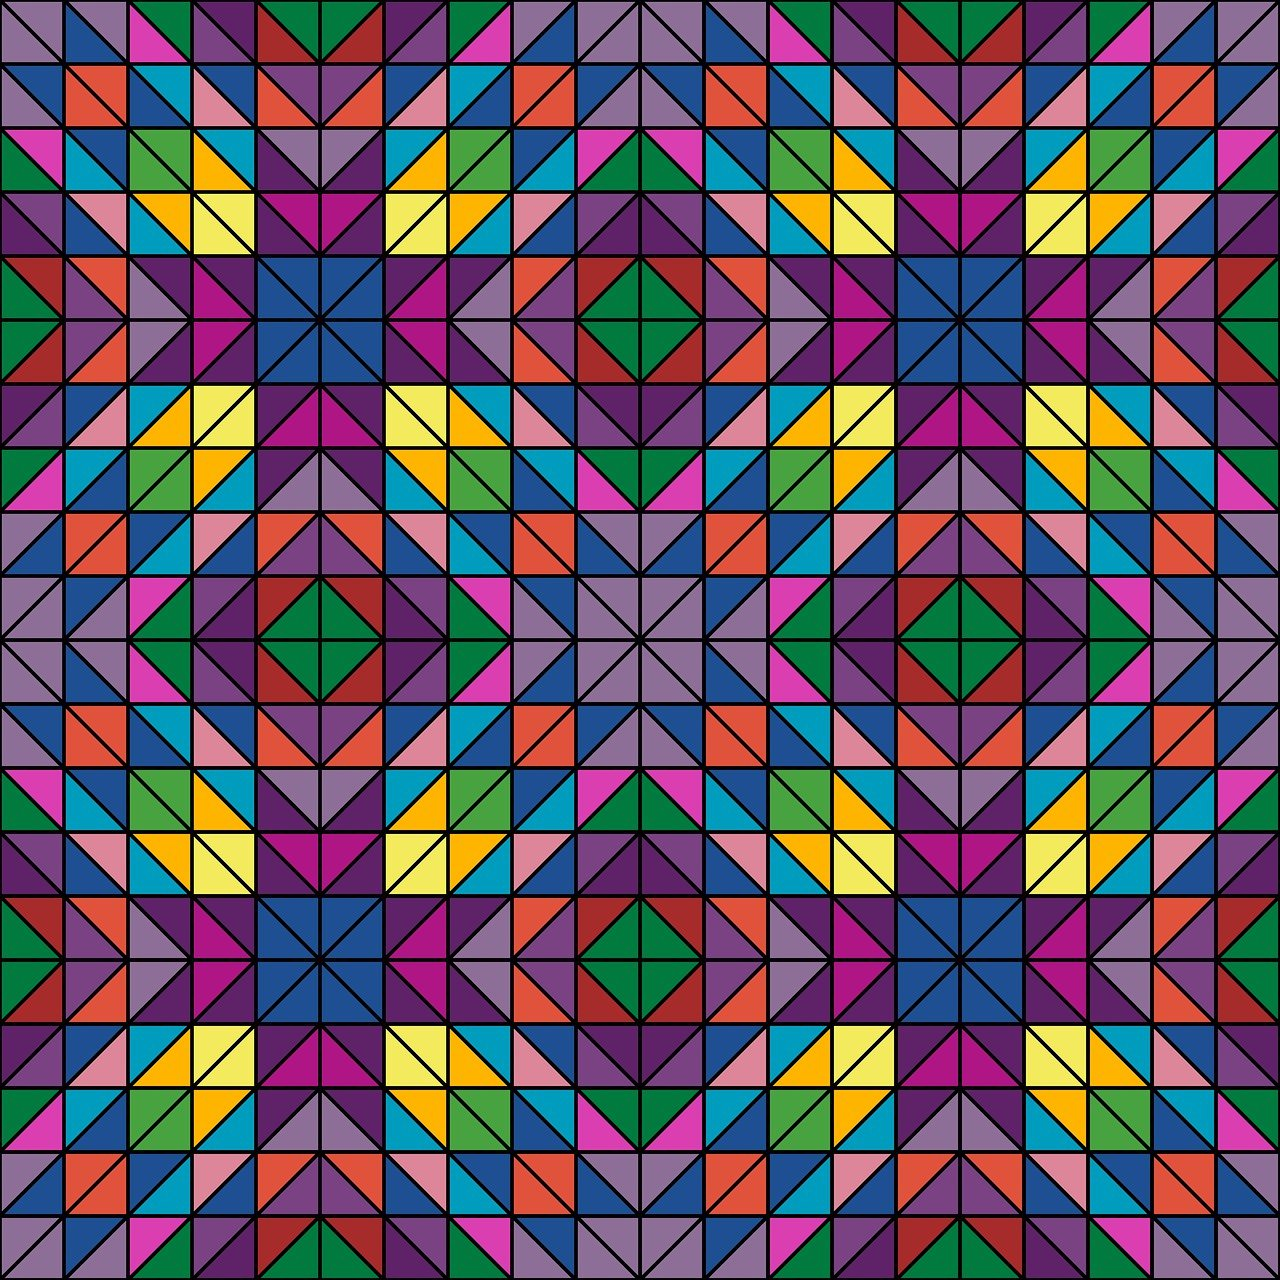 triangle-2721541_1280